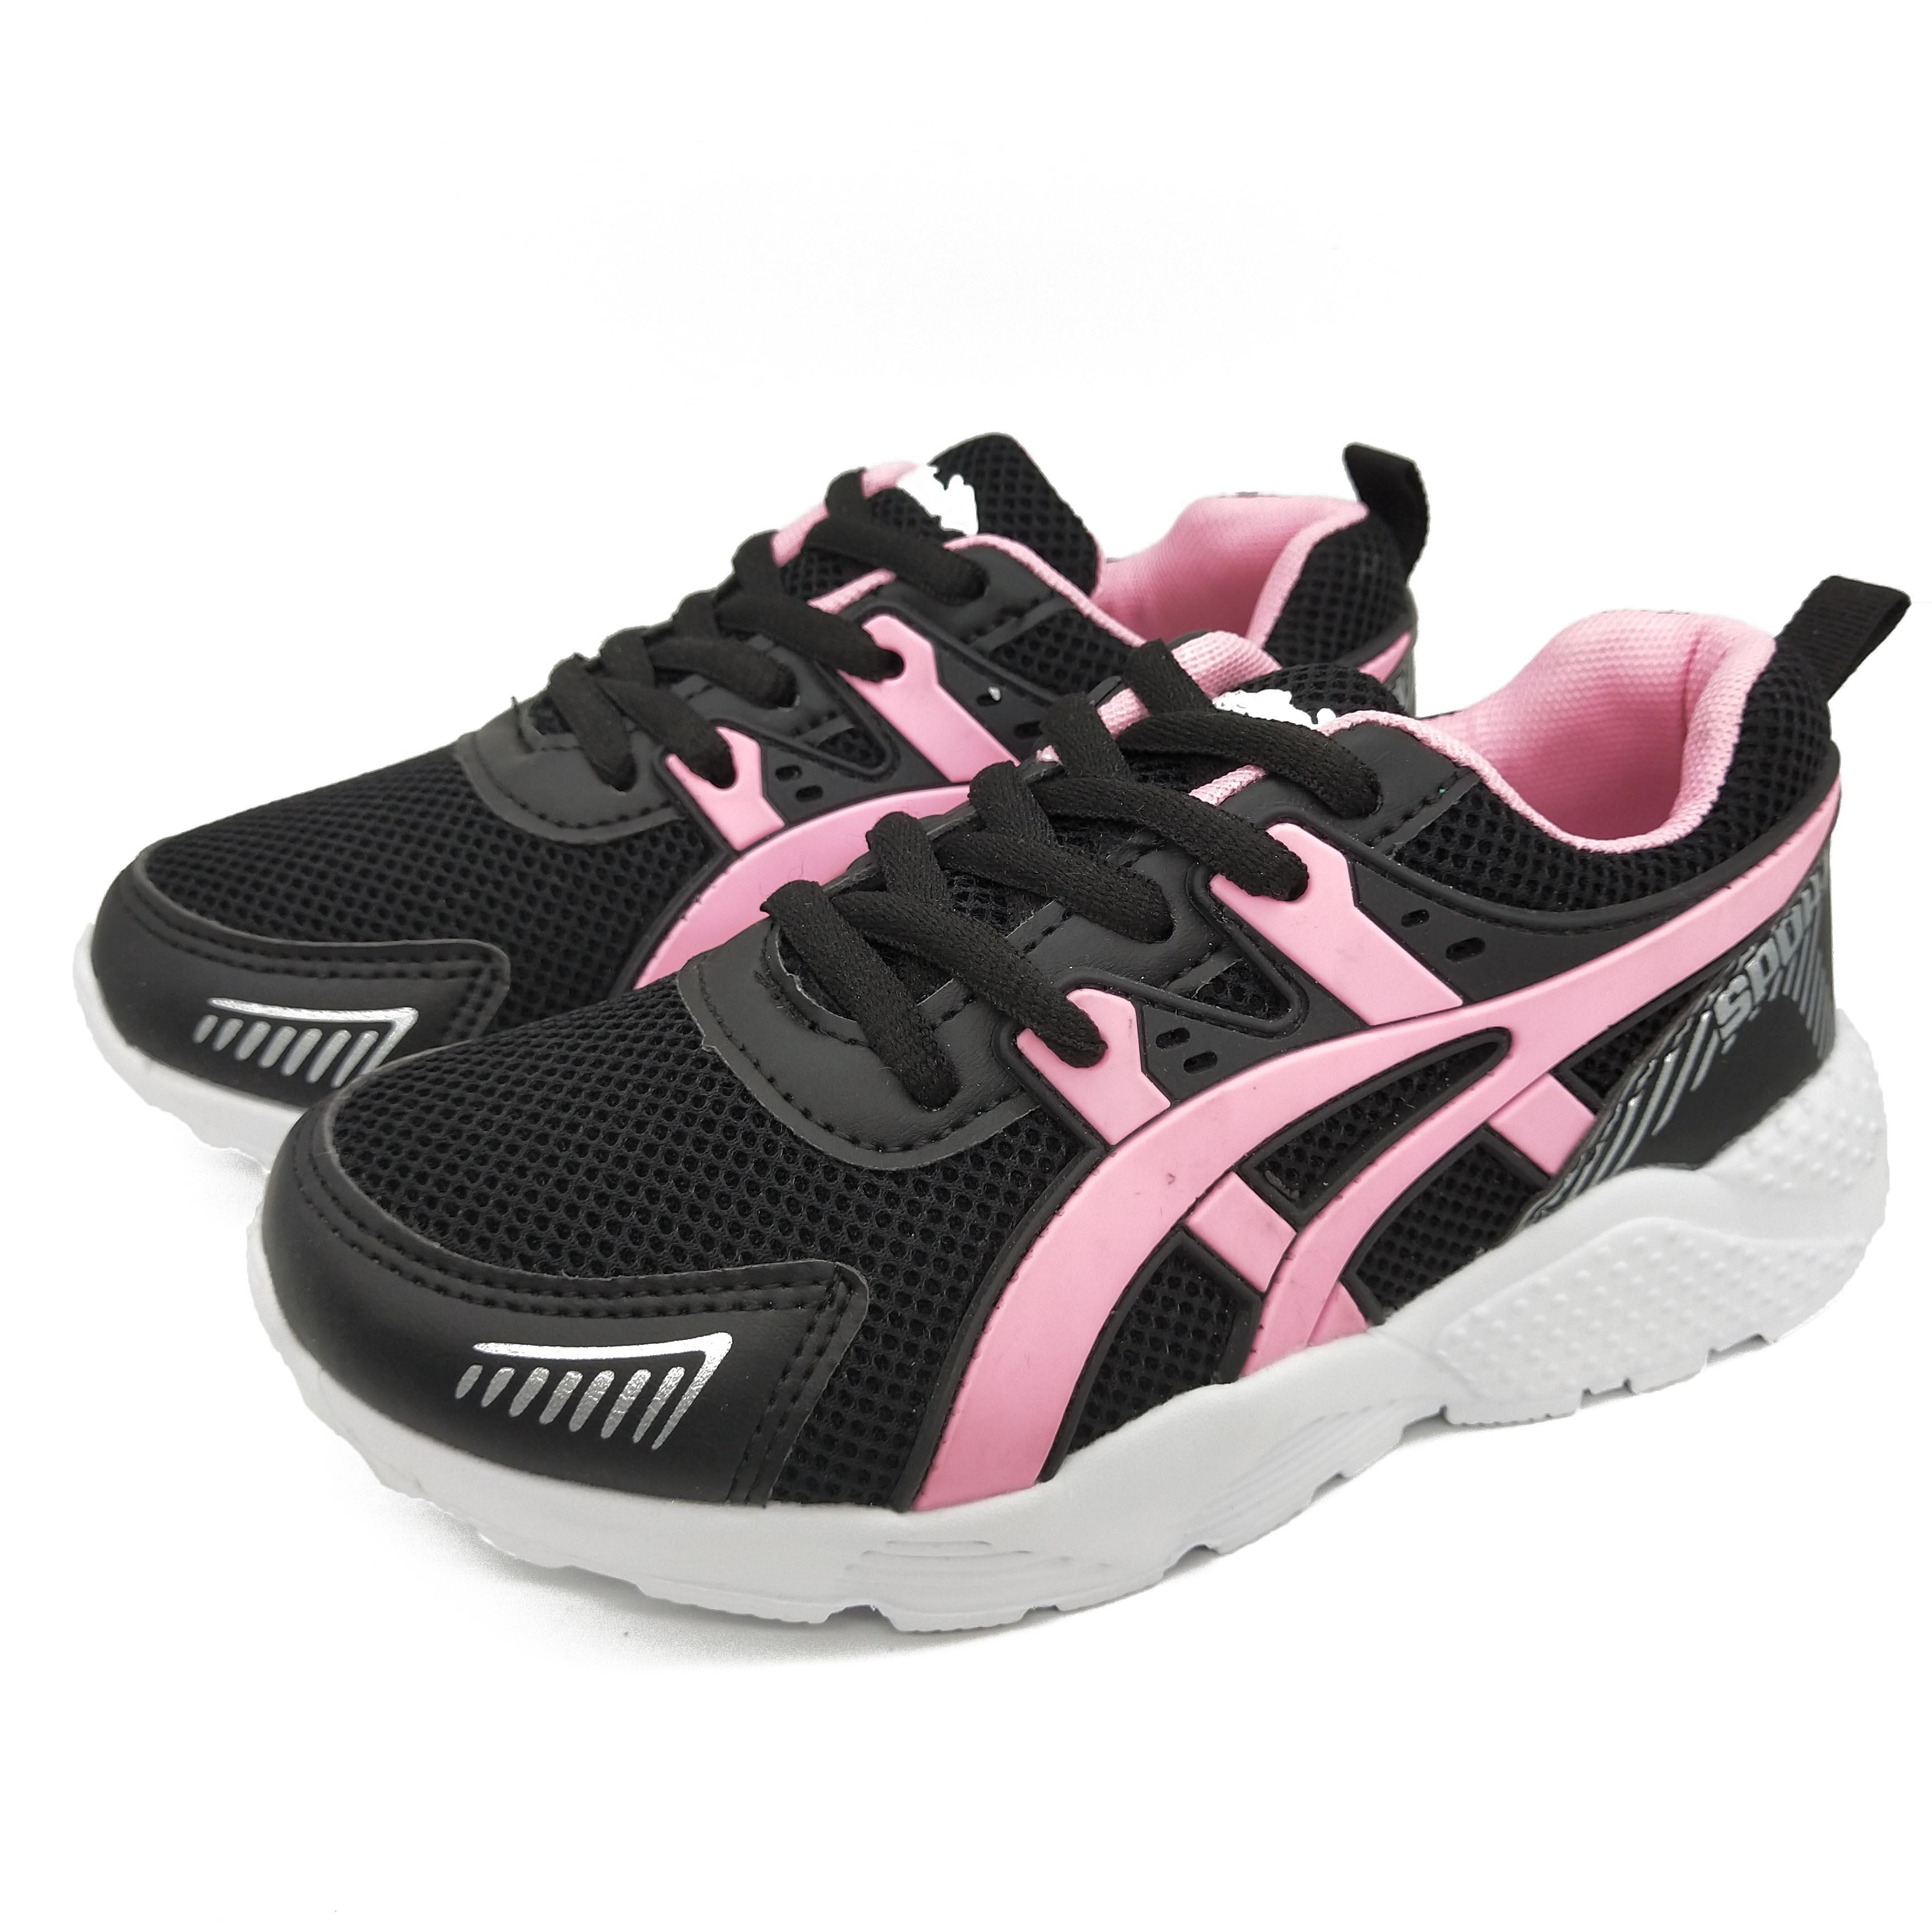 Kids Shoe Girls Sneakers Sports Shoes